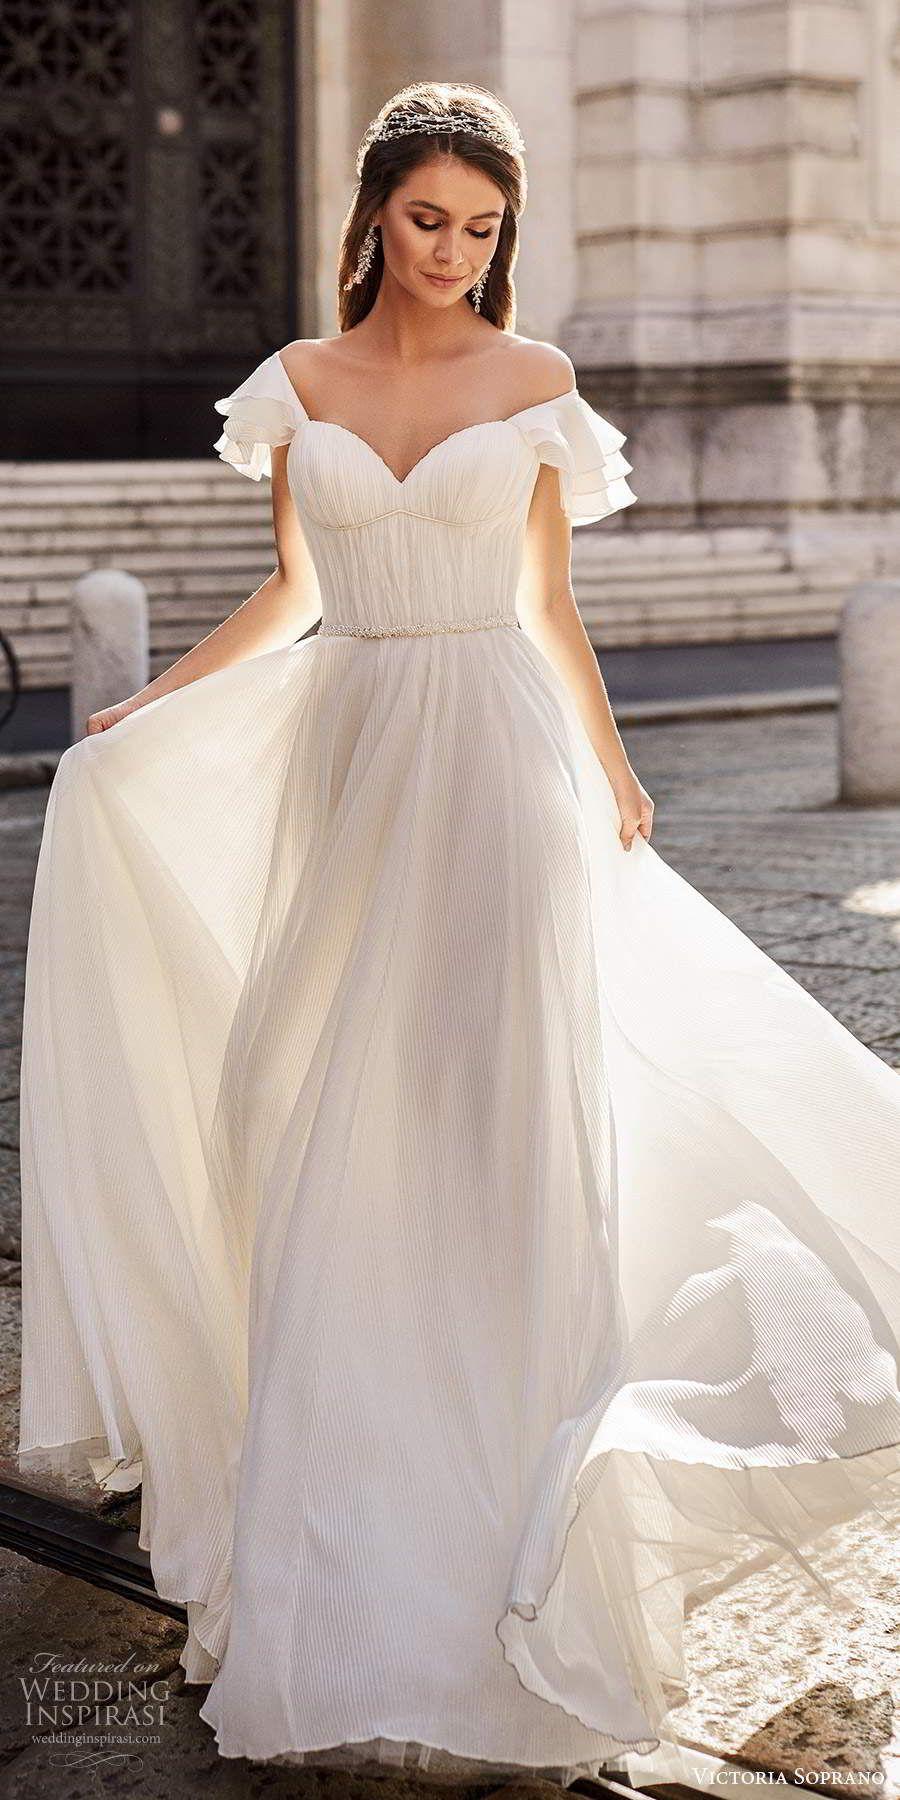 "Photo of Victoria Soprano 2020 ""Star of Milan"" Wedding Dresses | Wedding Inspirasi"